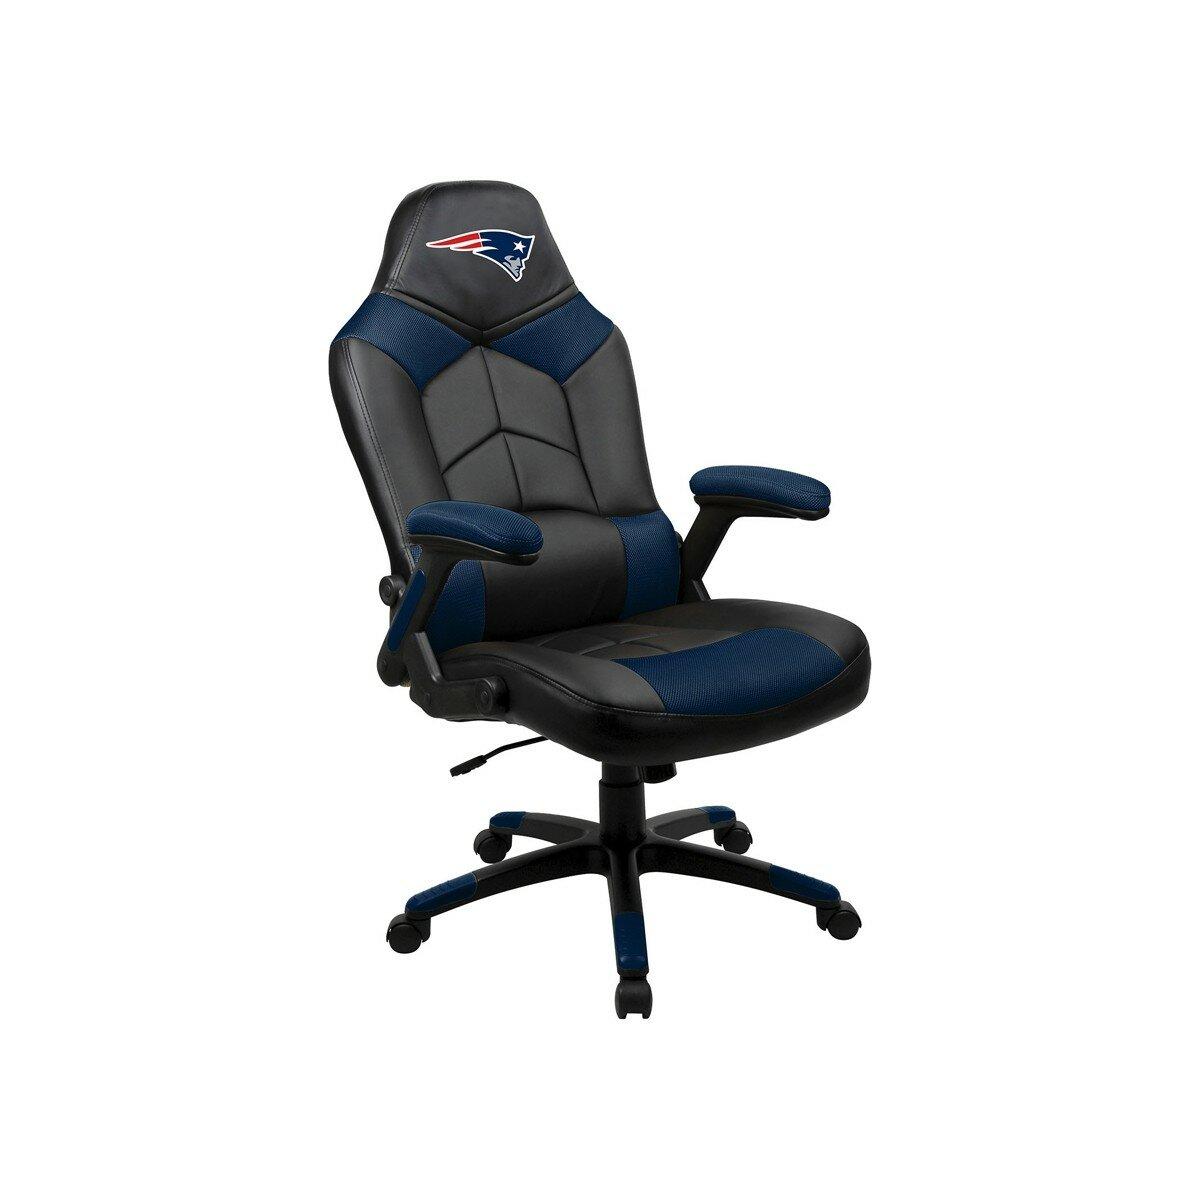 Imperial International Nfl Oversized Gaming Chair Wayfair